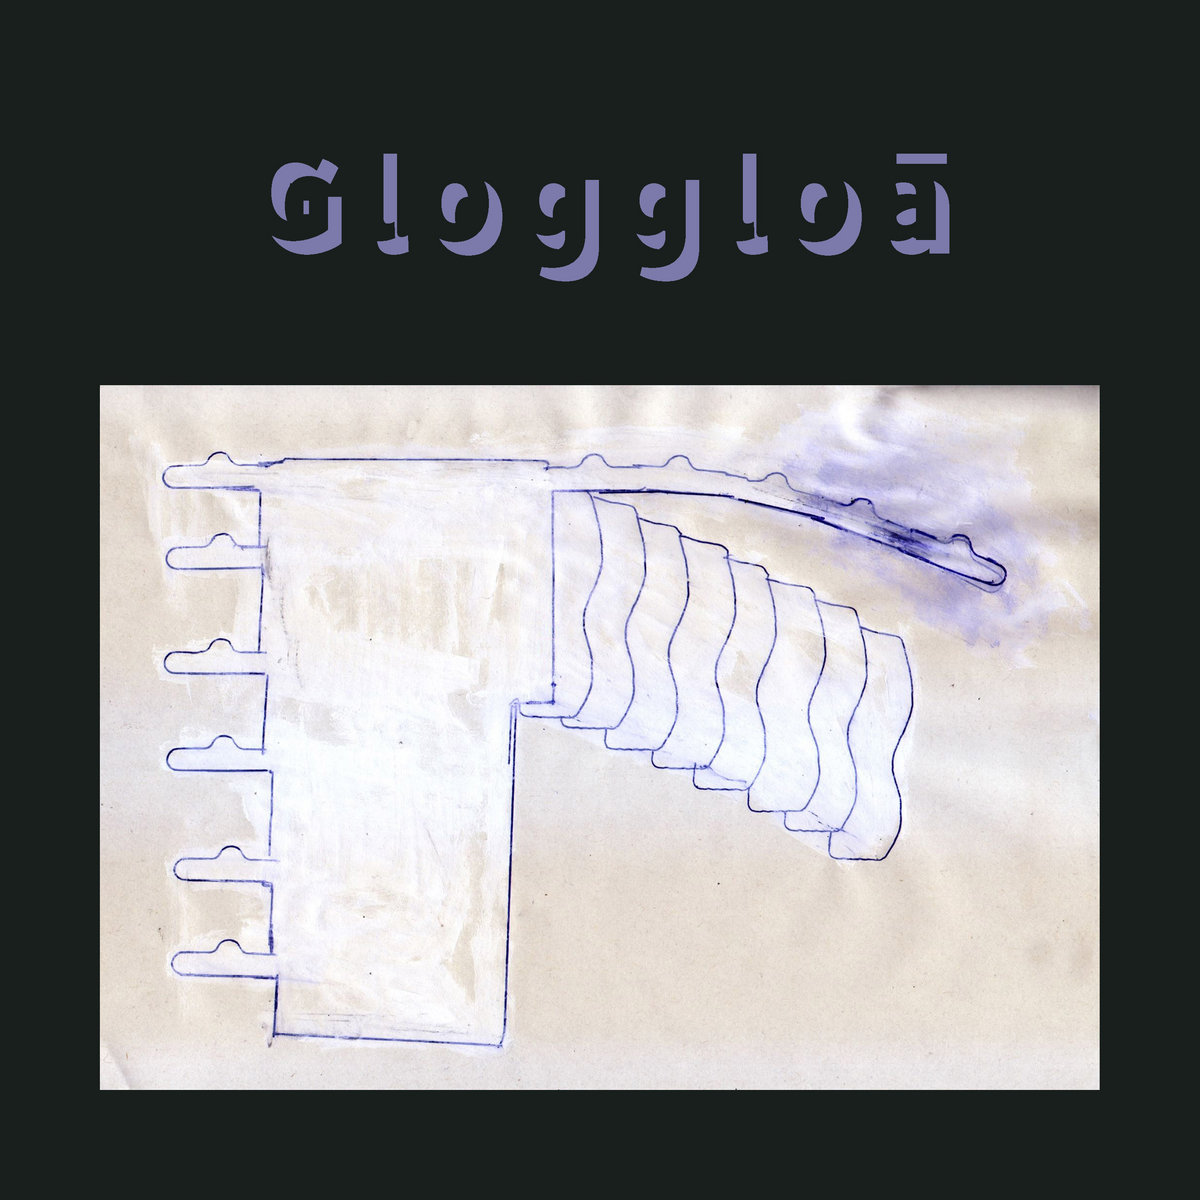 V.A. – Gloggloā